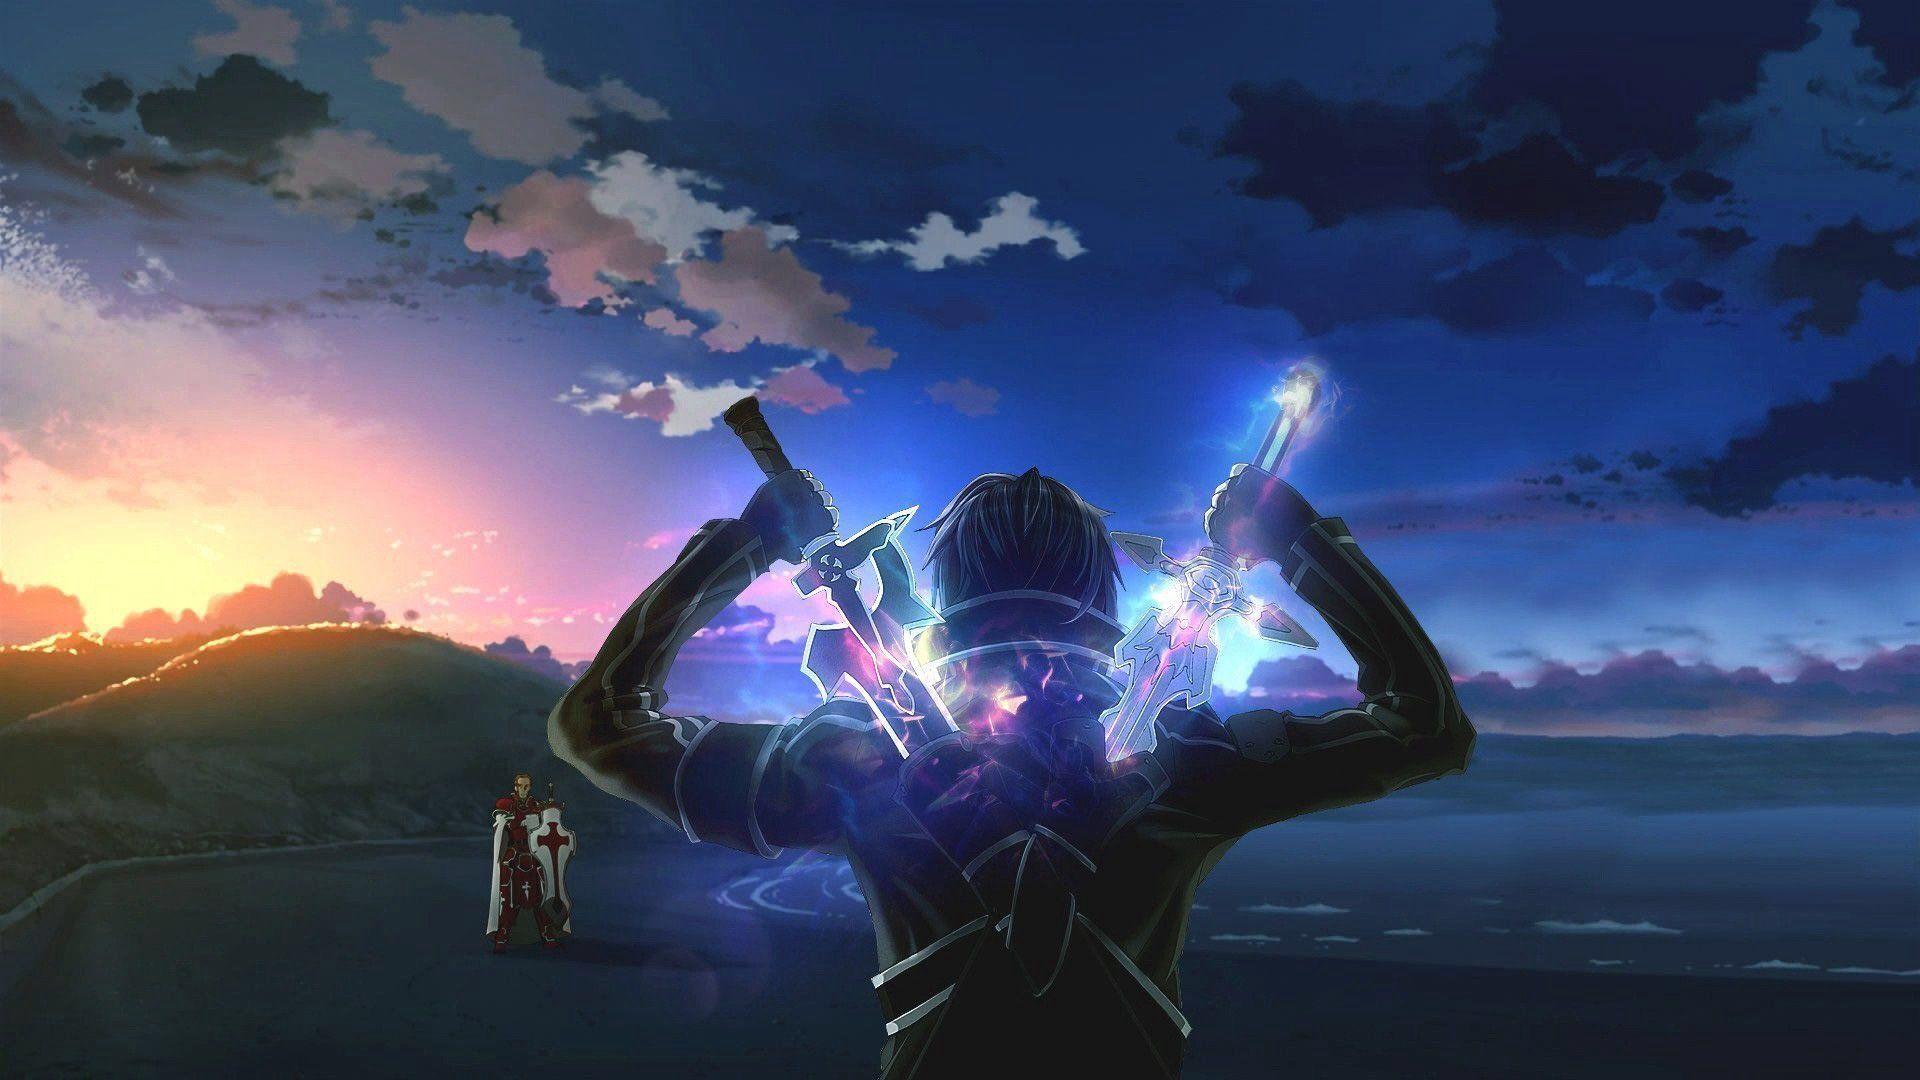 Im genes de anime para otakus full hd 7 cosas que - Full hd anime wallpaper pack ...